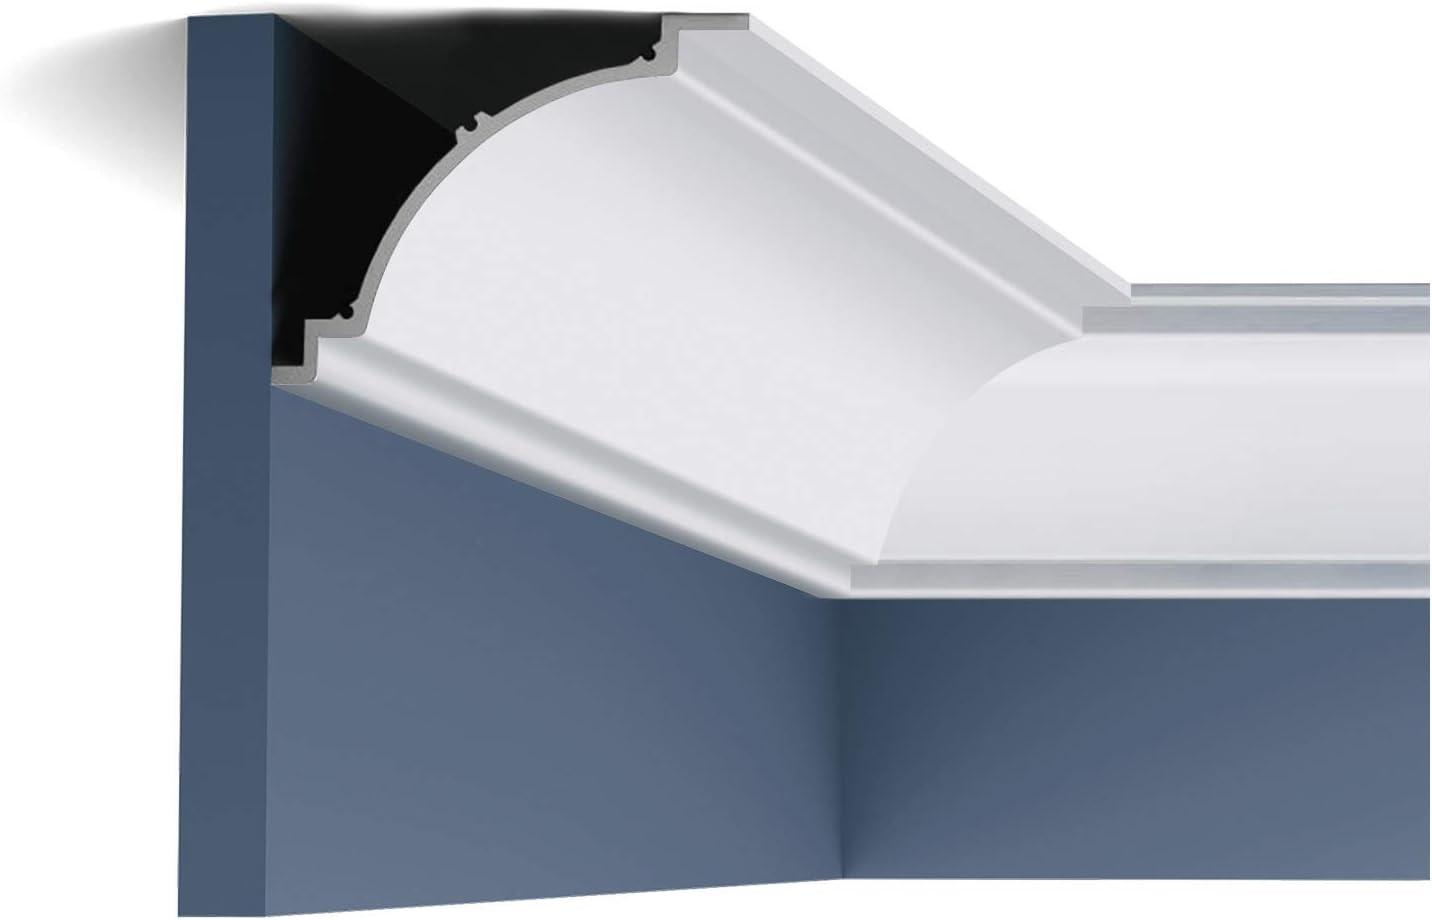 Cornice Moulding Orac Decor C820 XTERIO Decorative Moulding Timeless Classic White 2.44m